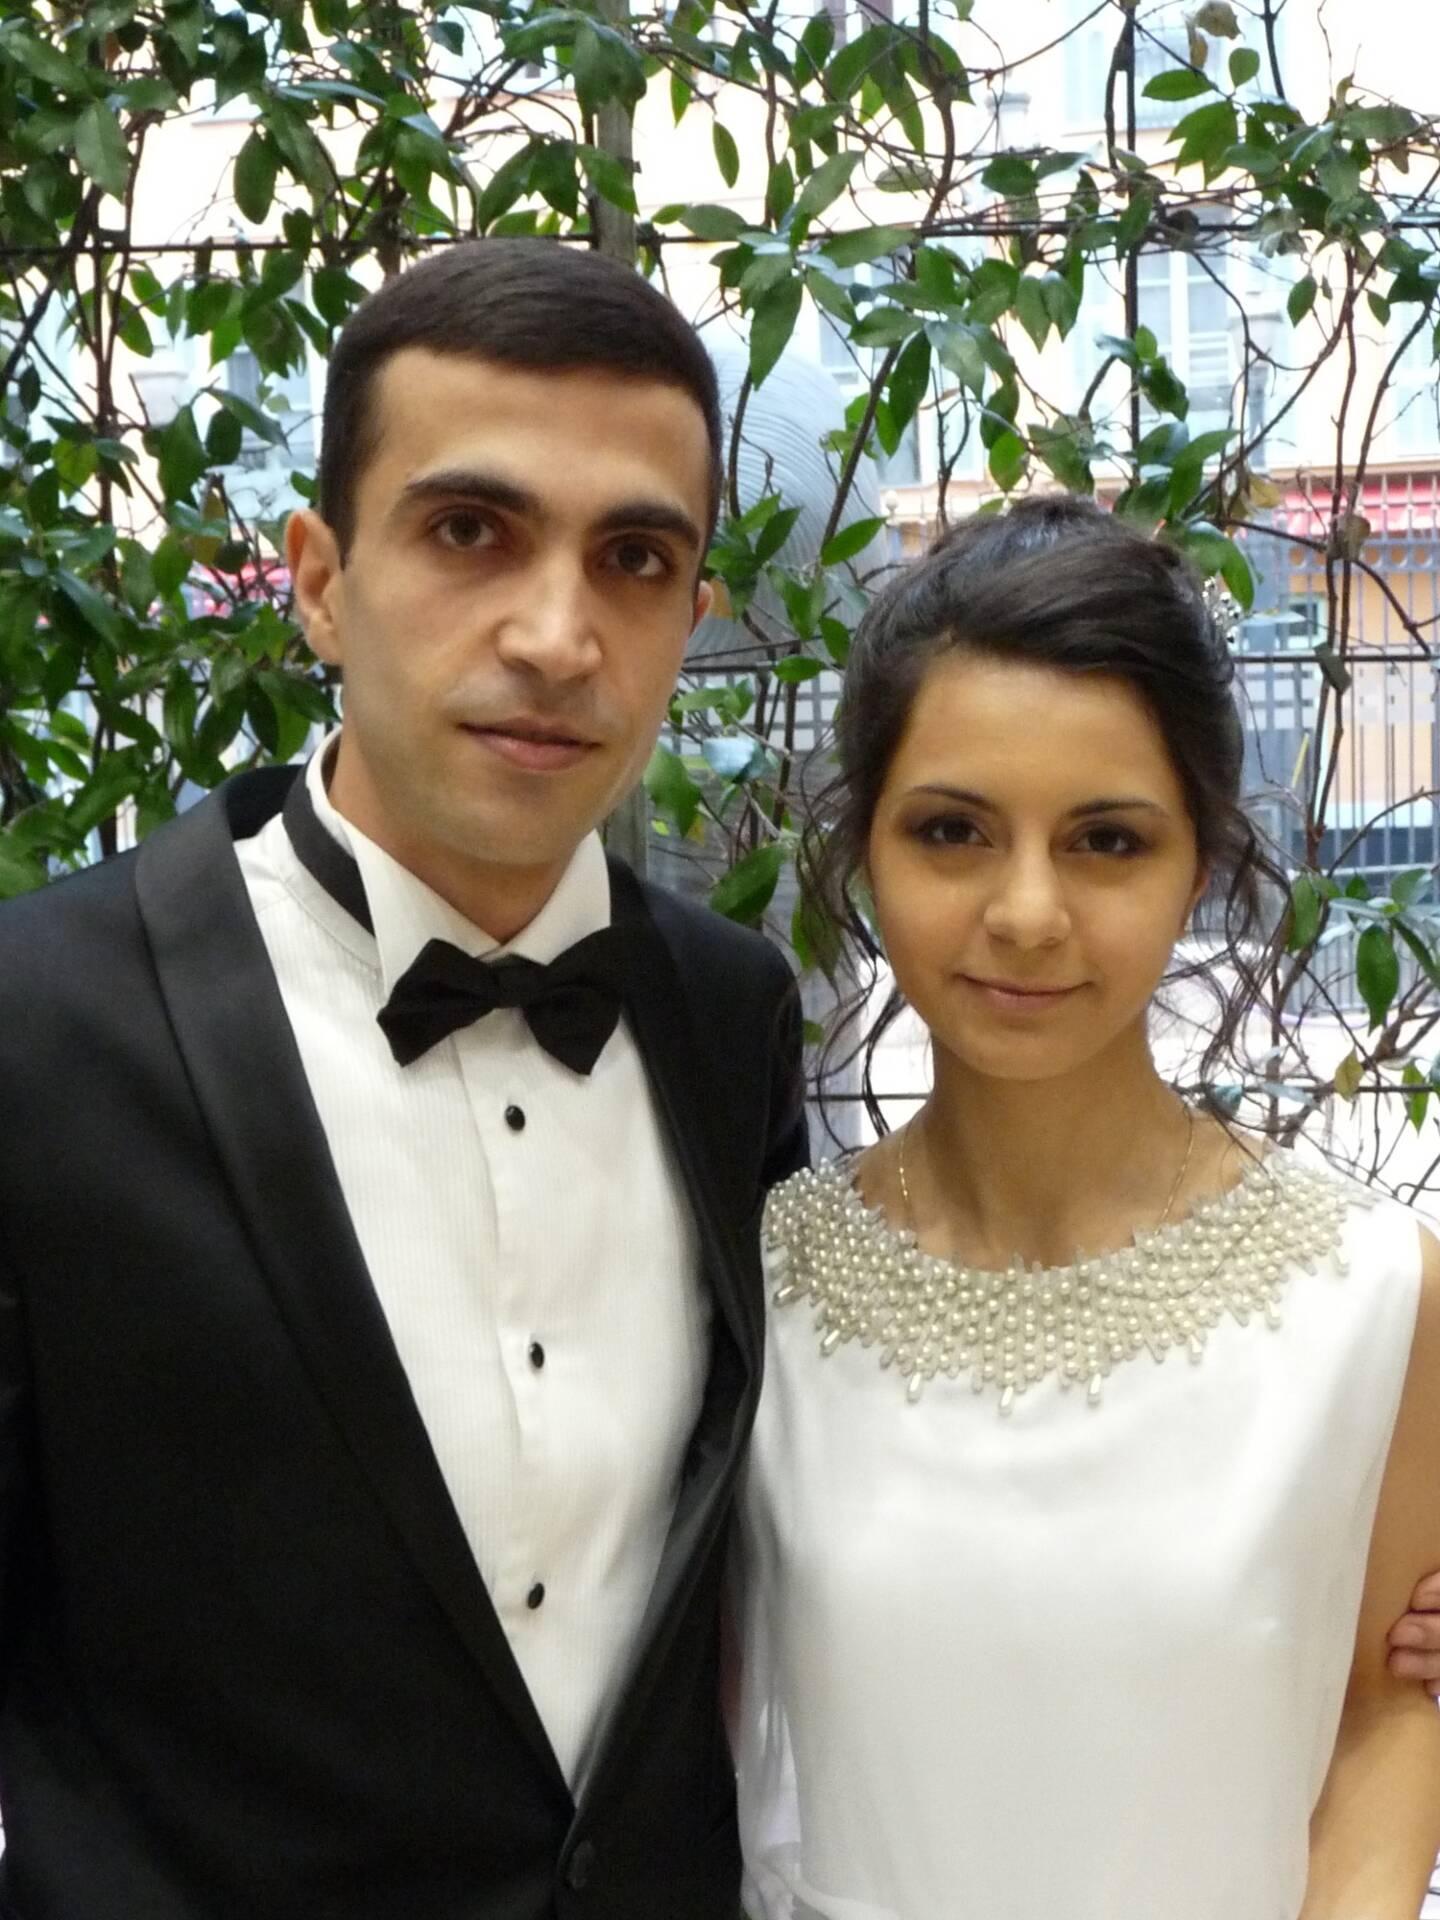 Aroutun Aroutunian, réceptionniste, et Tatevik Hakkobjanyan, étudiante.